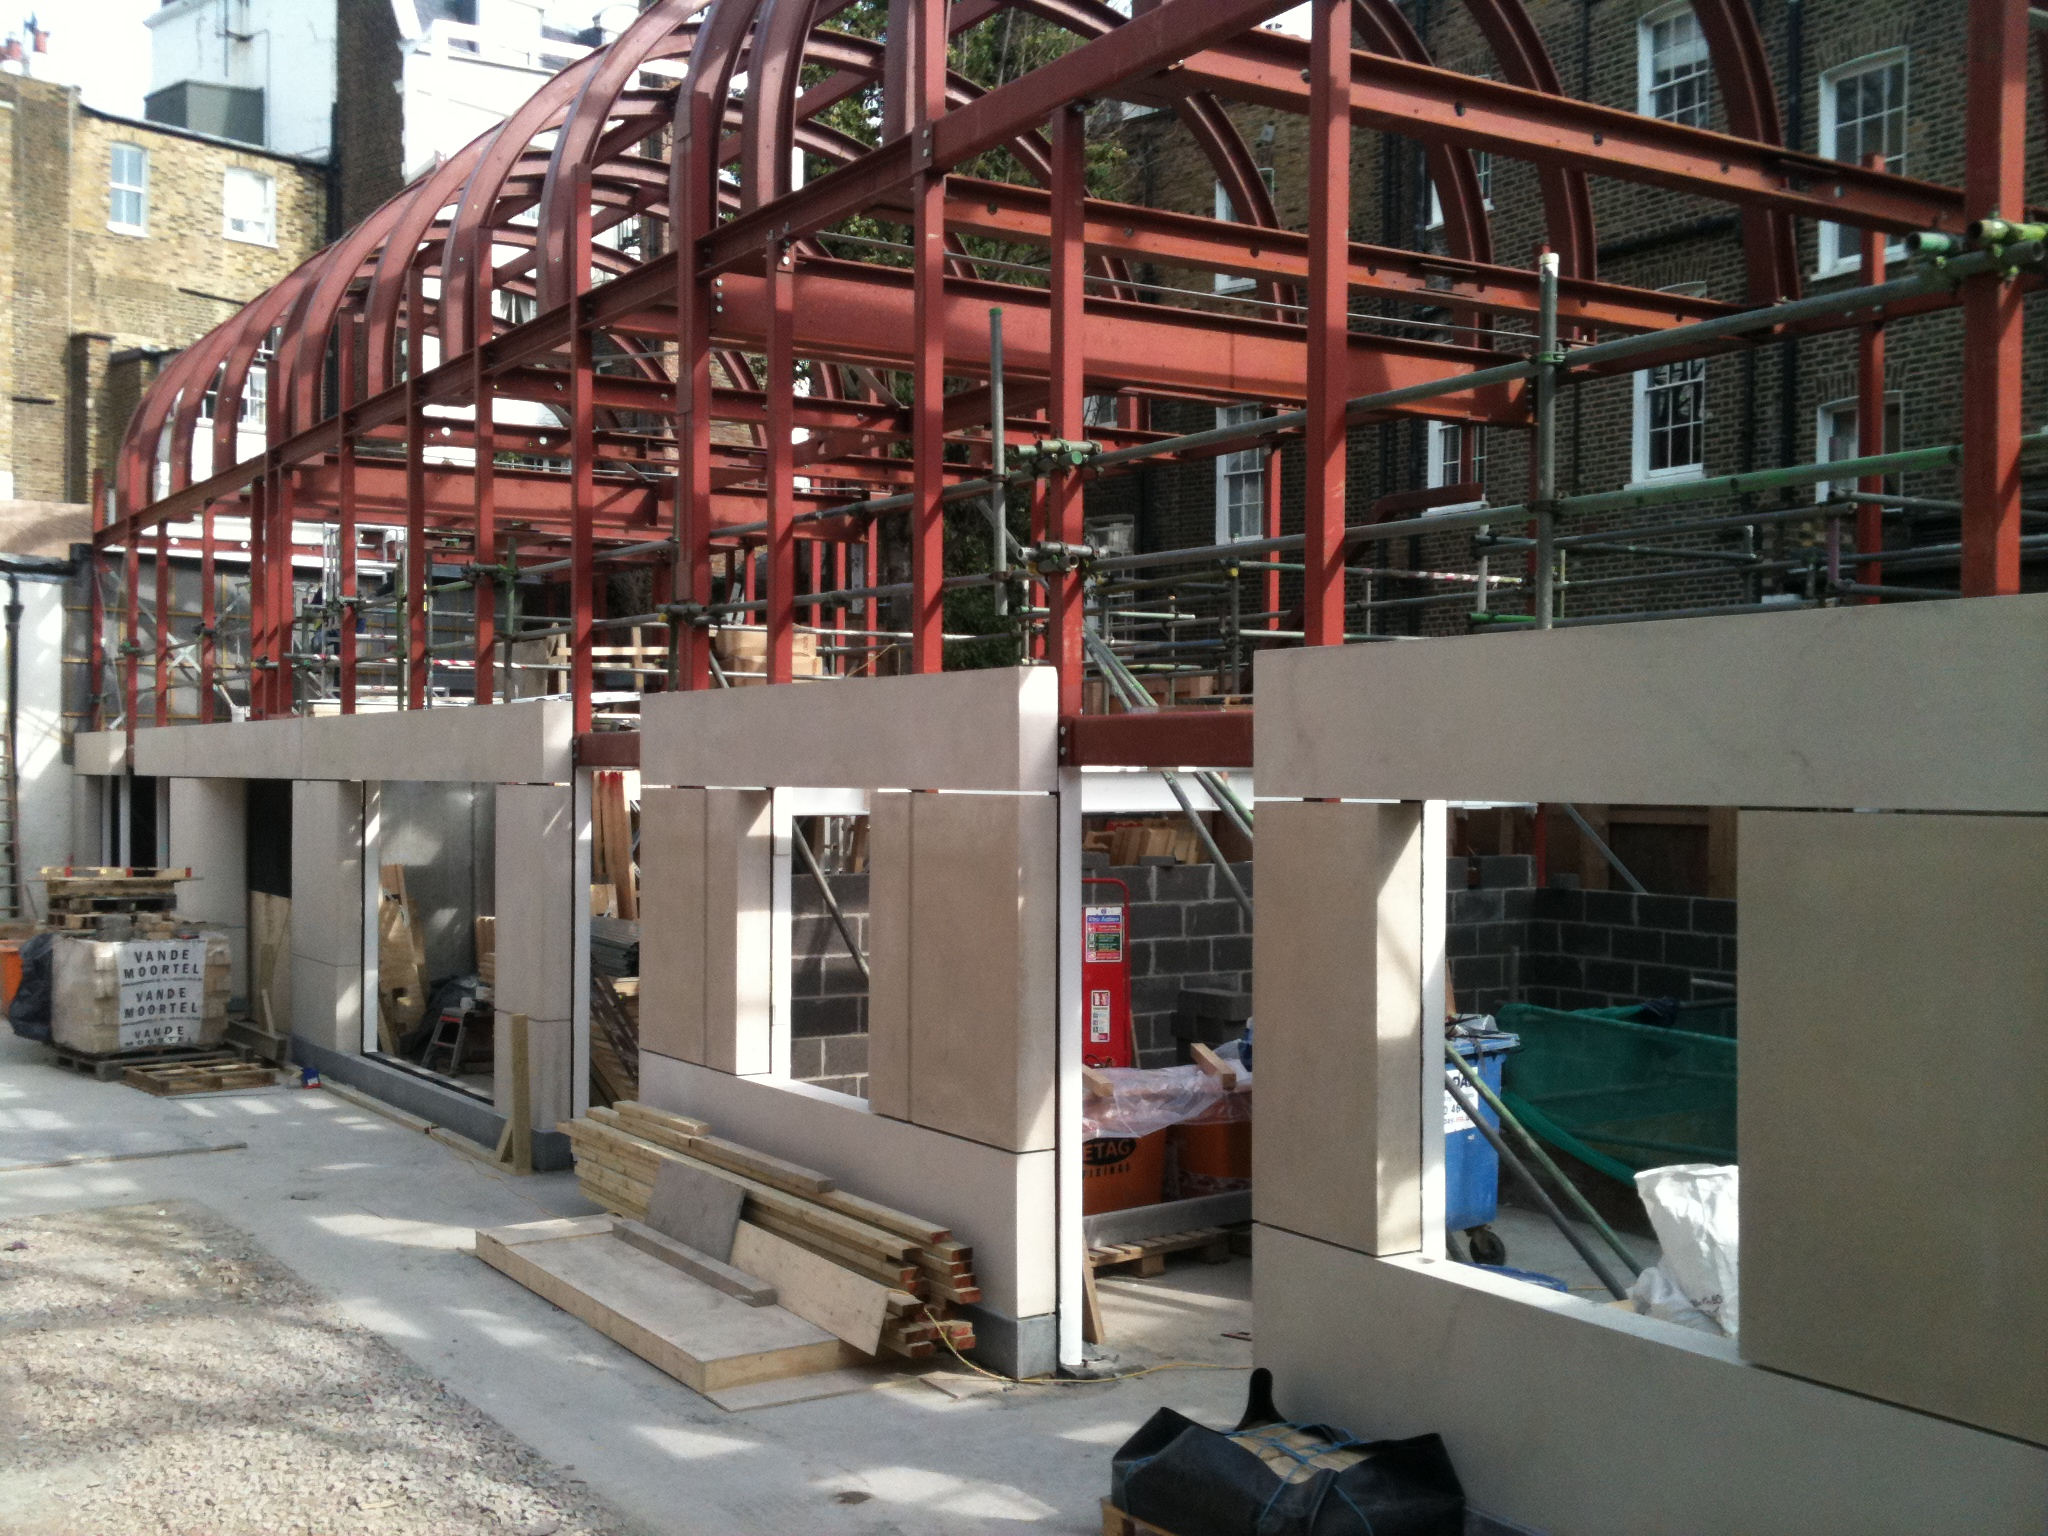 Glynd Mews, Knightsbridge under construction. Lewis Deck sound proof floors with underfloor heating.